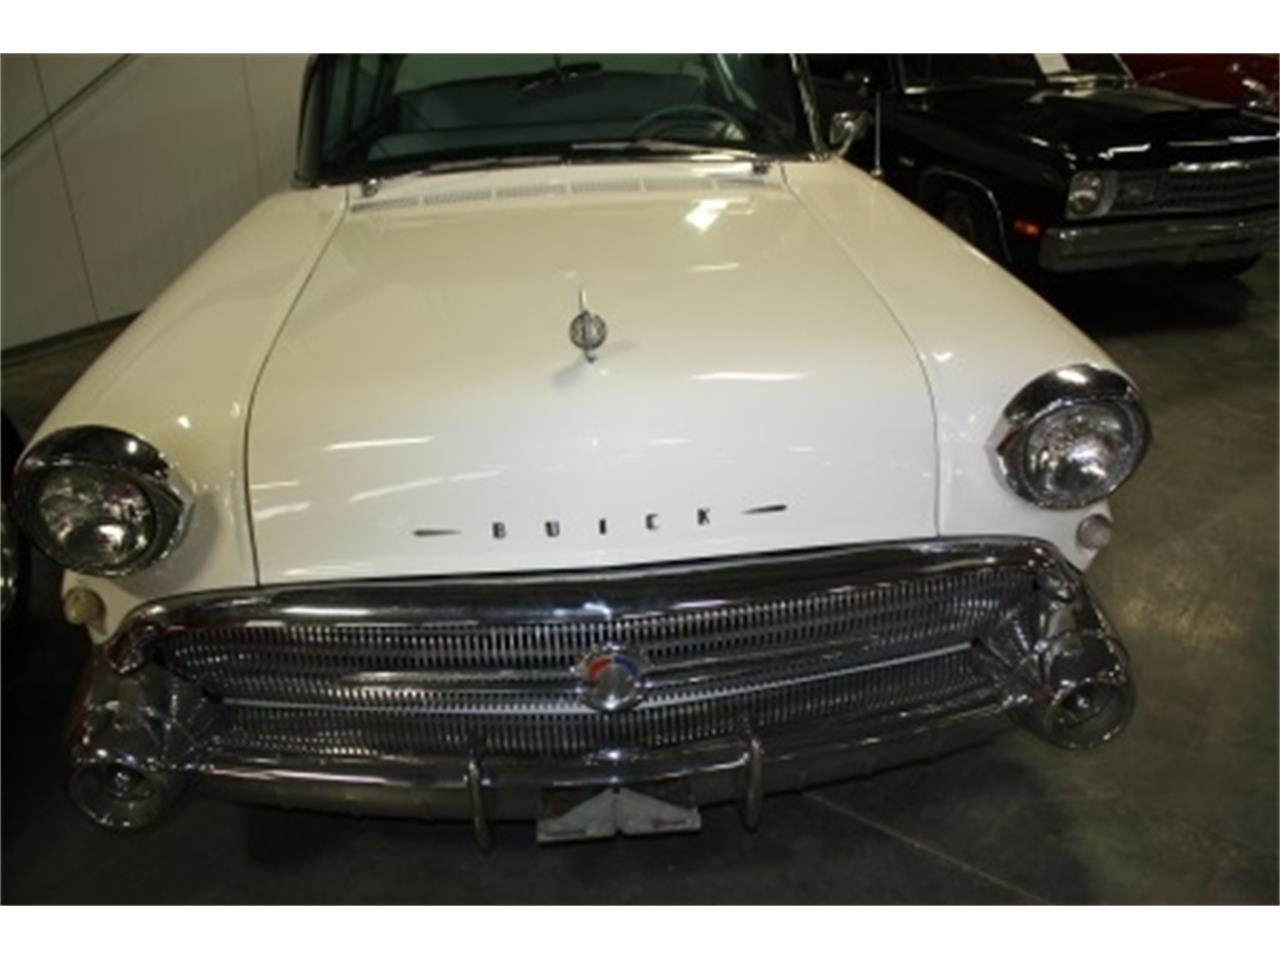 Large Picture of Classic 1957 Super located in Branson Missouri - $20,000.00 - DSCE